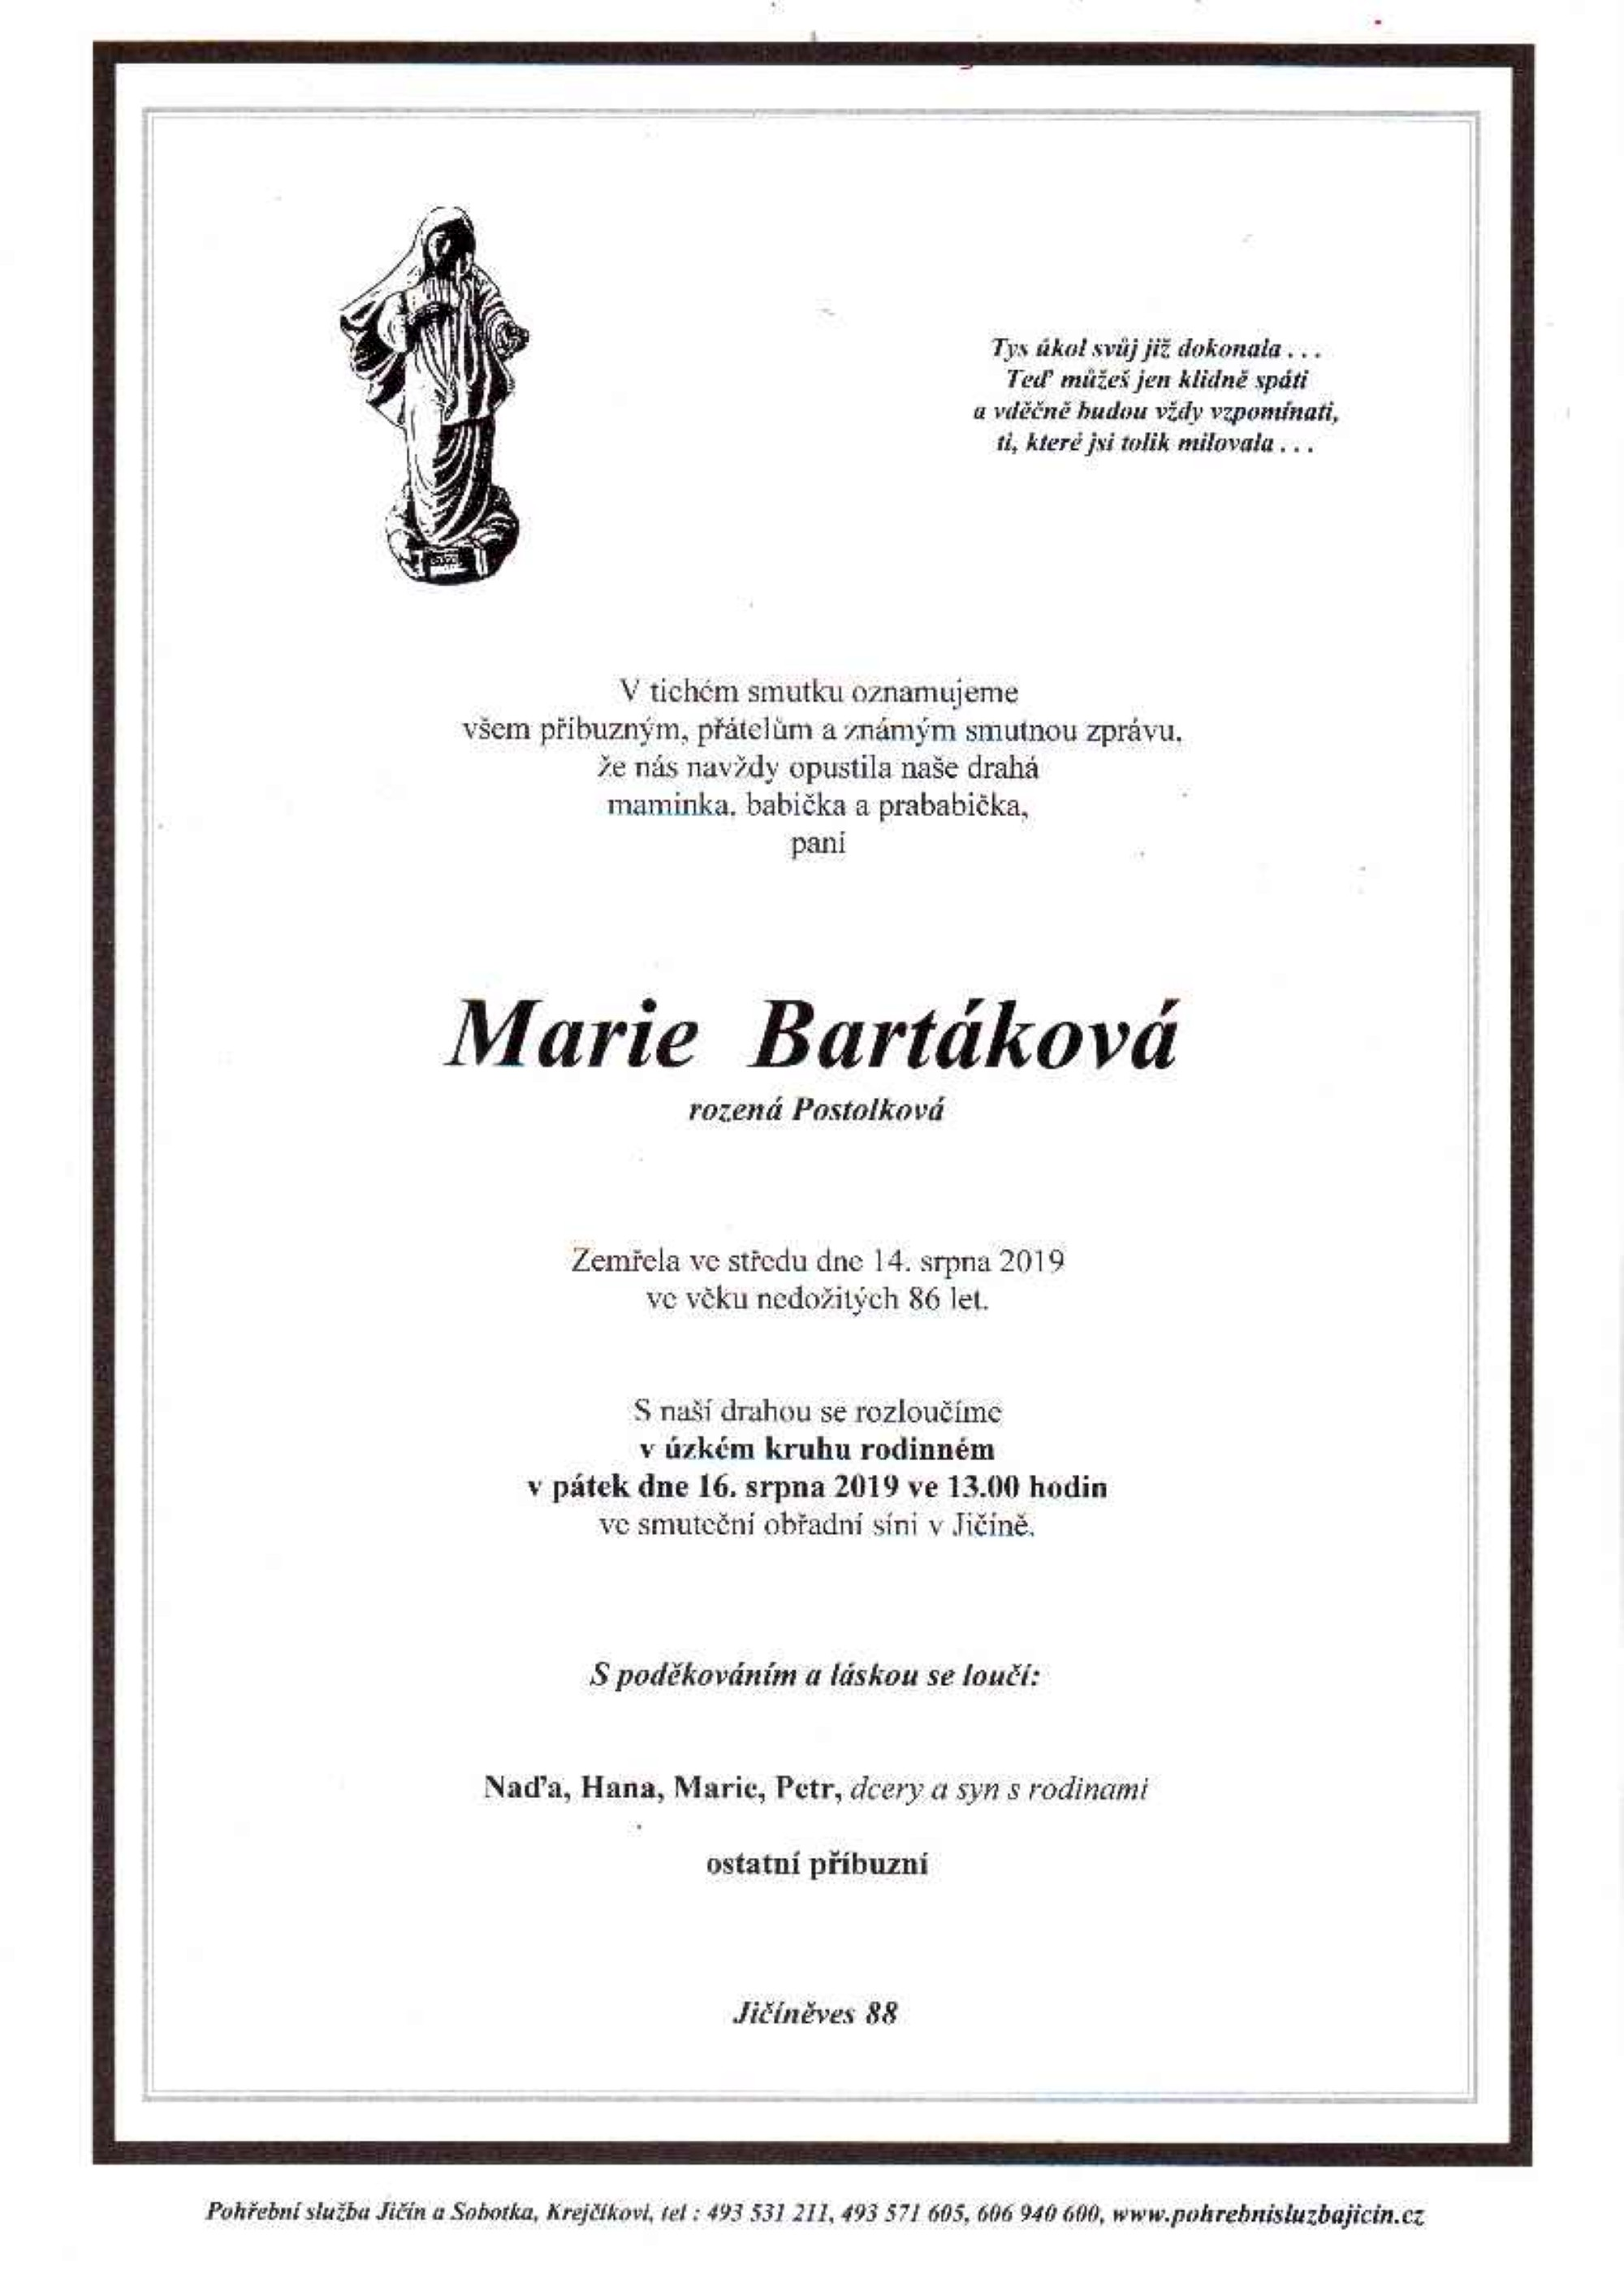 Marie Bartáková